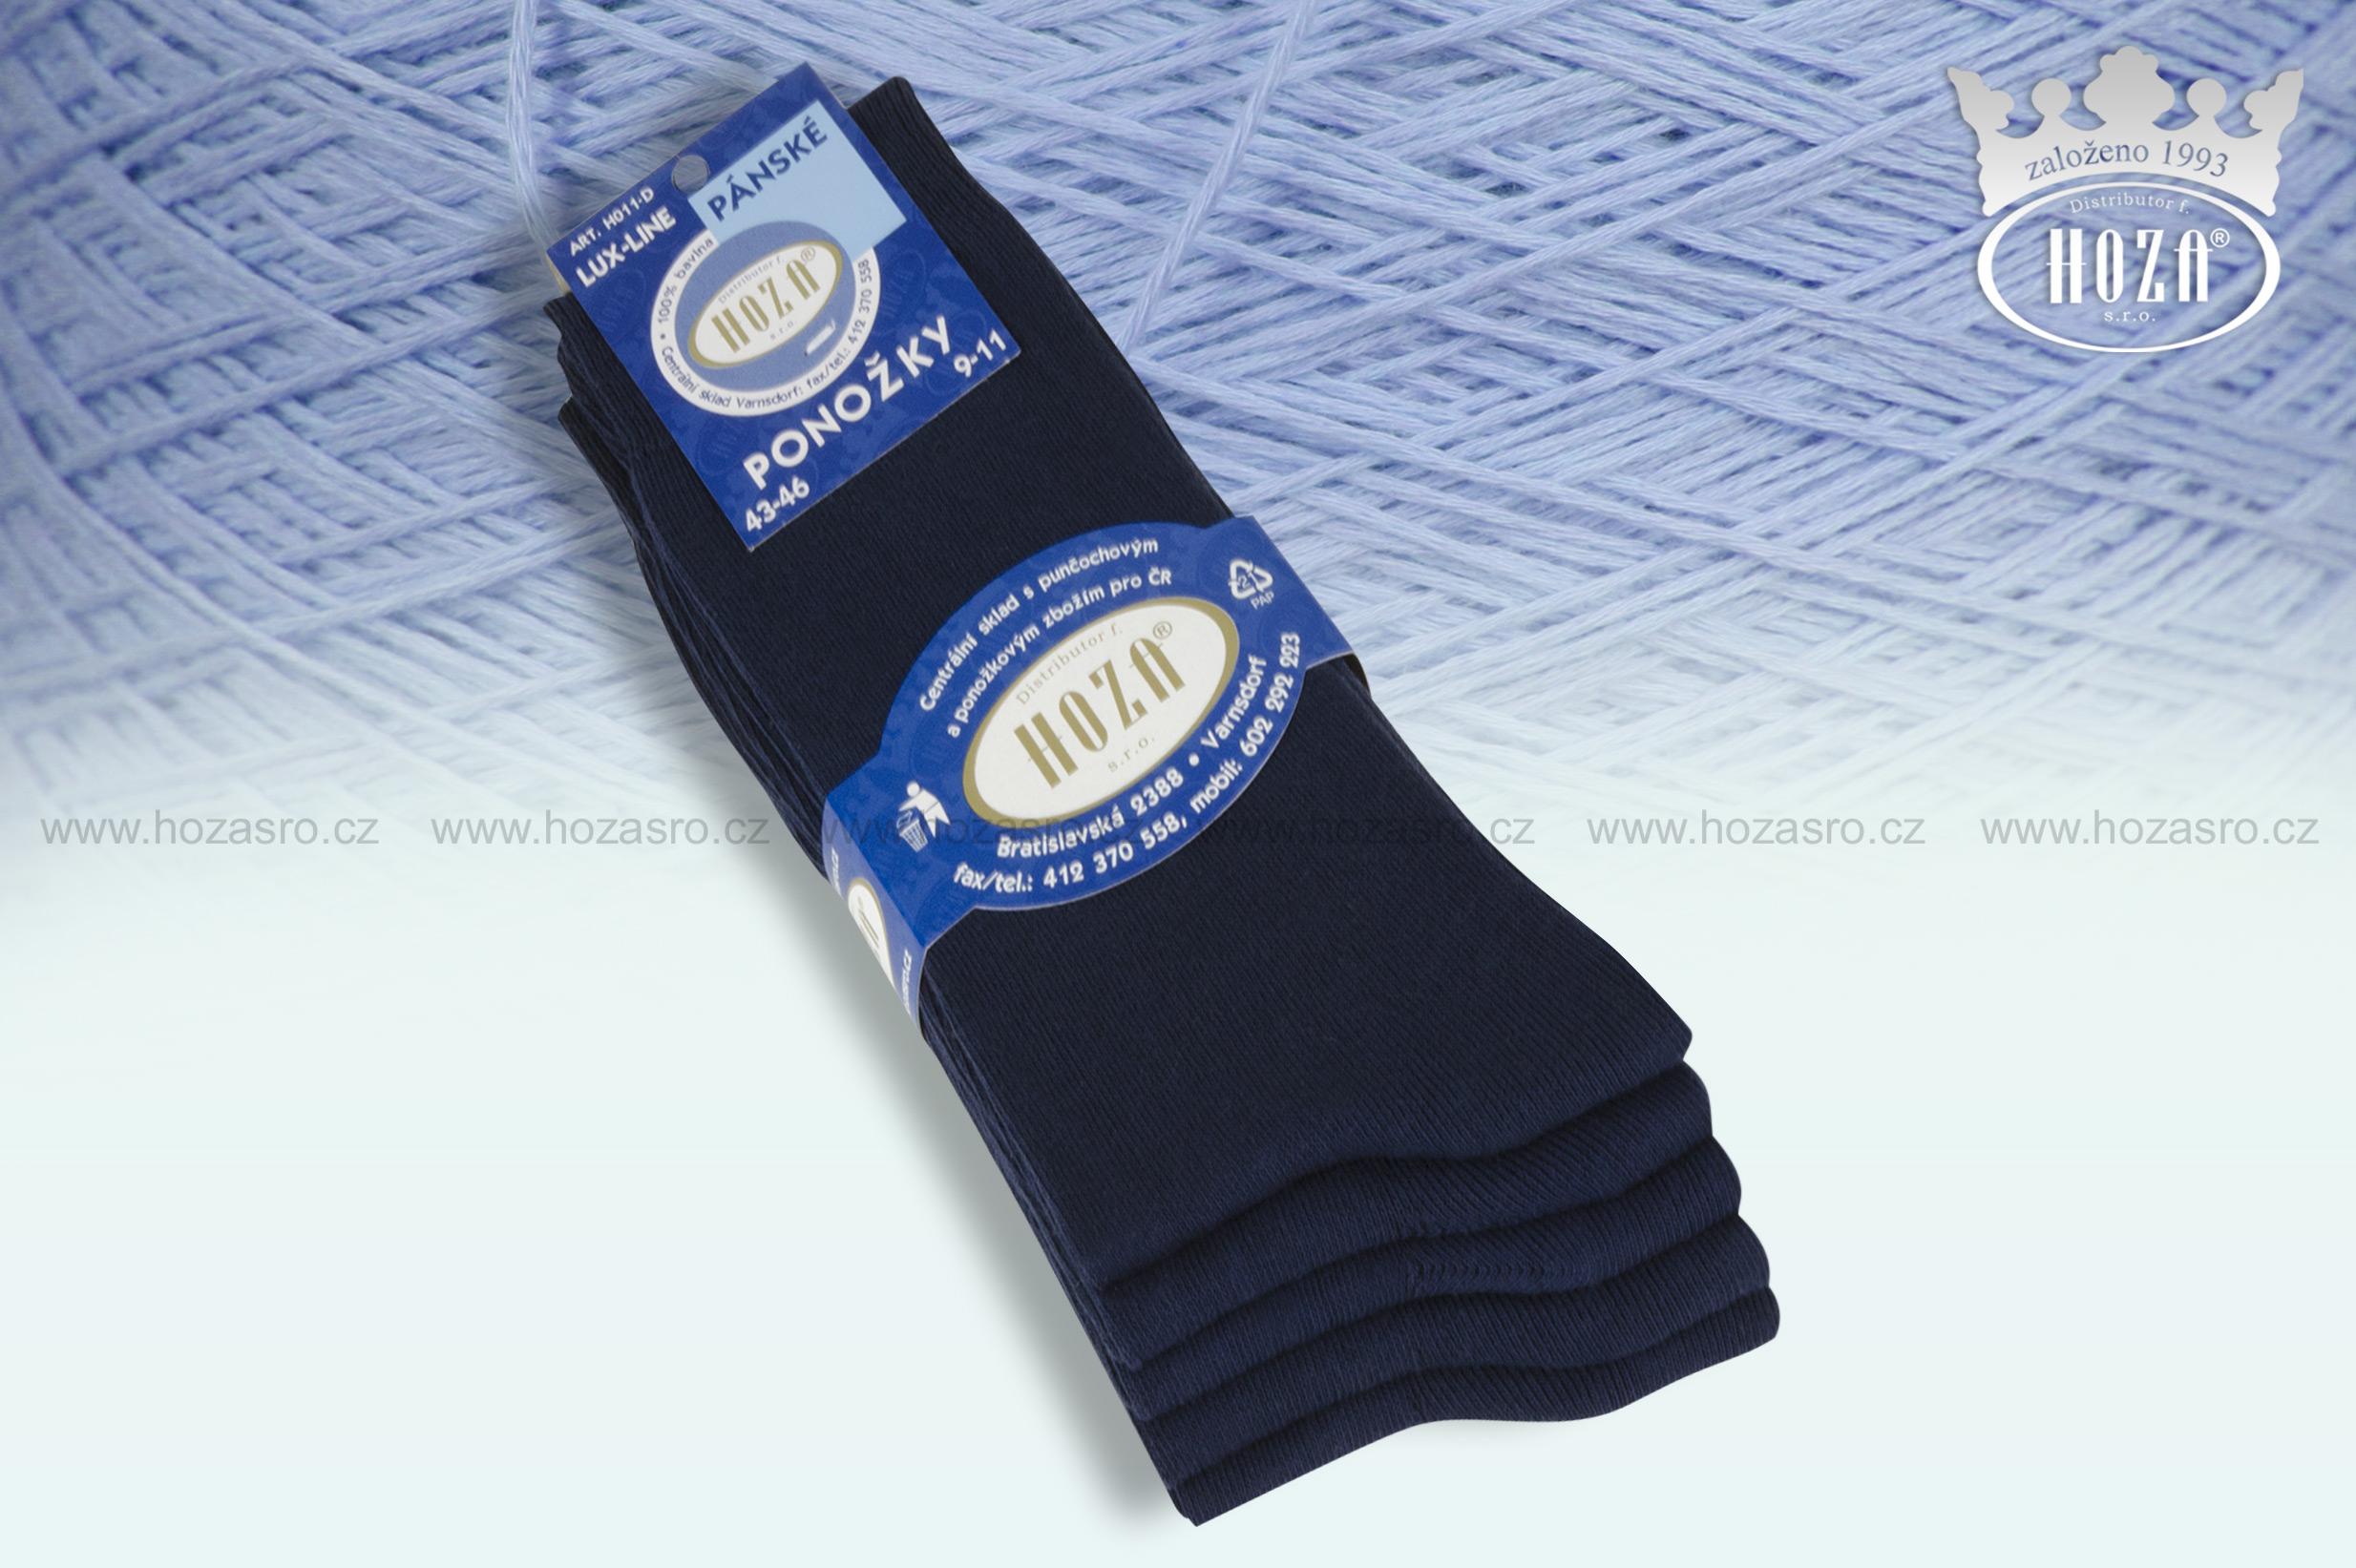 Pánské ponožky hladké, 100% bavlna - tm. modrý mix - H011-D